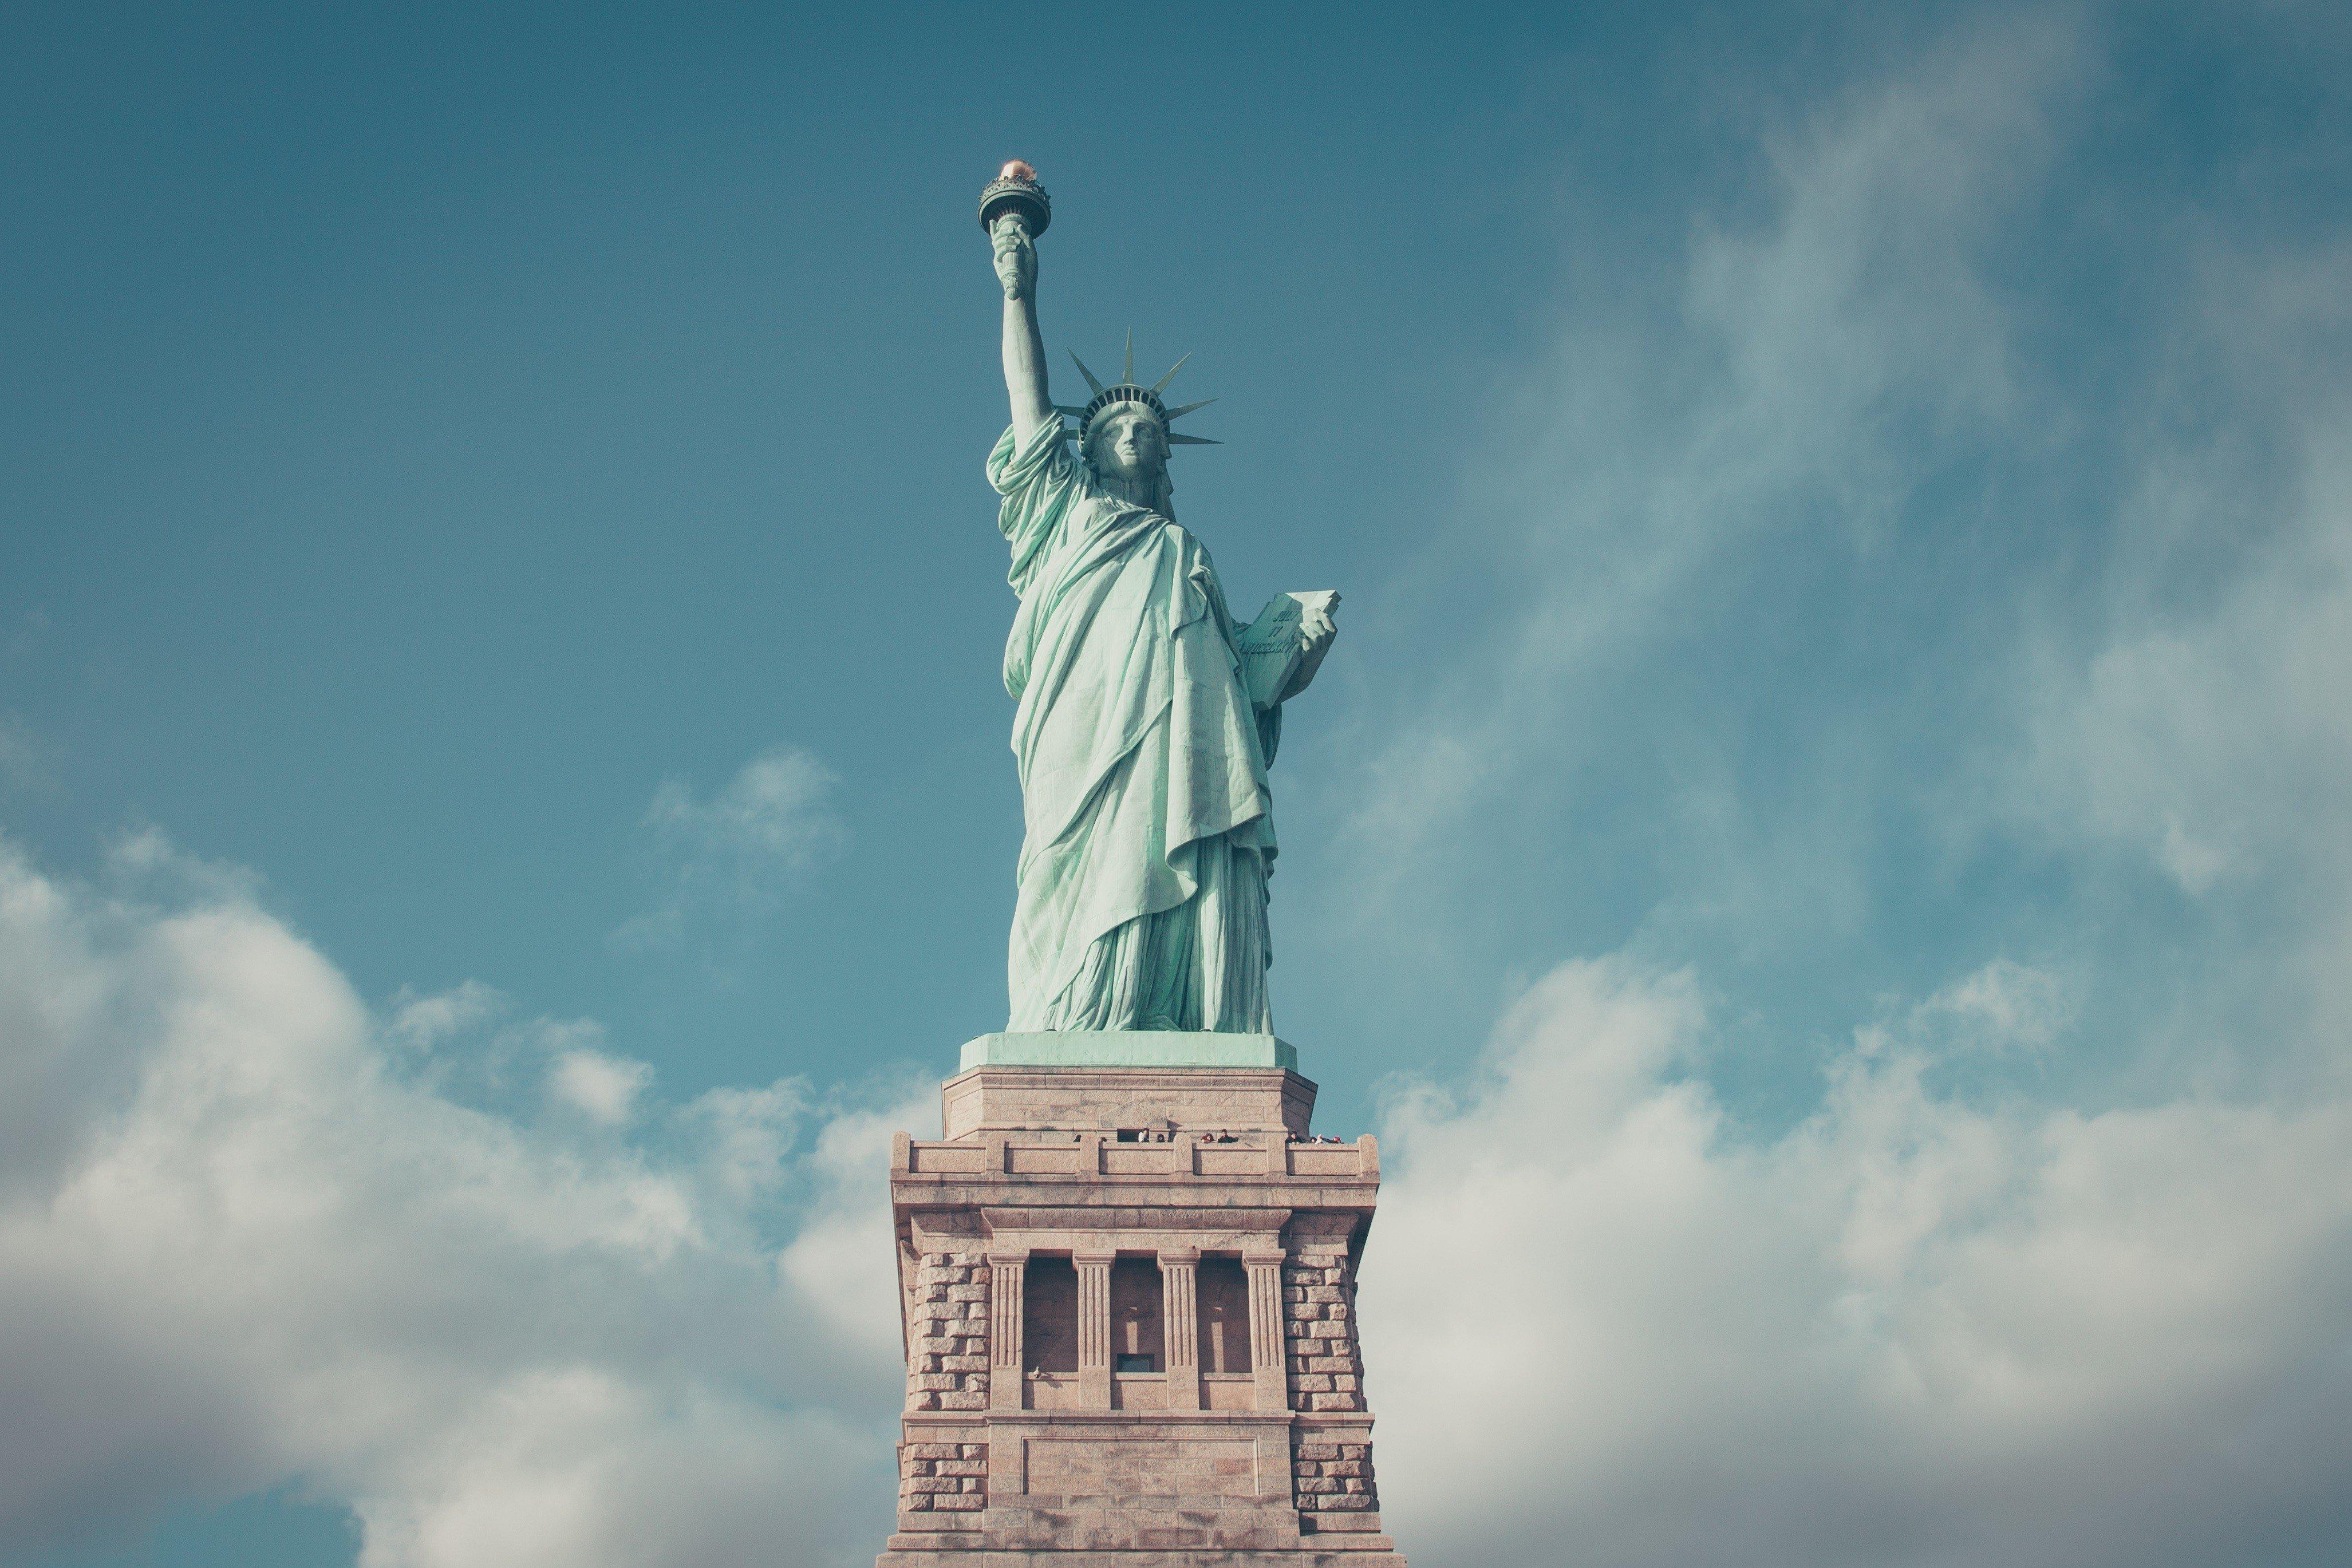 еще знаете, картинки американские памятники умолку